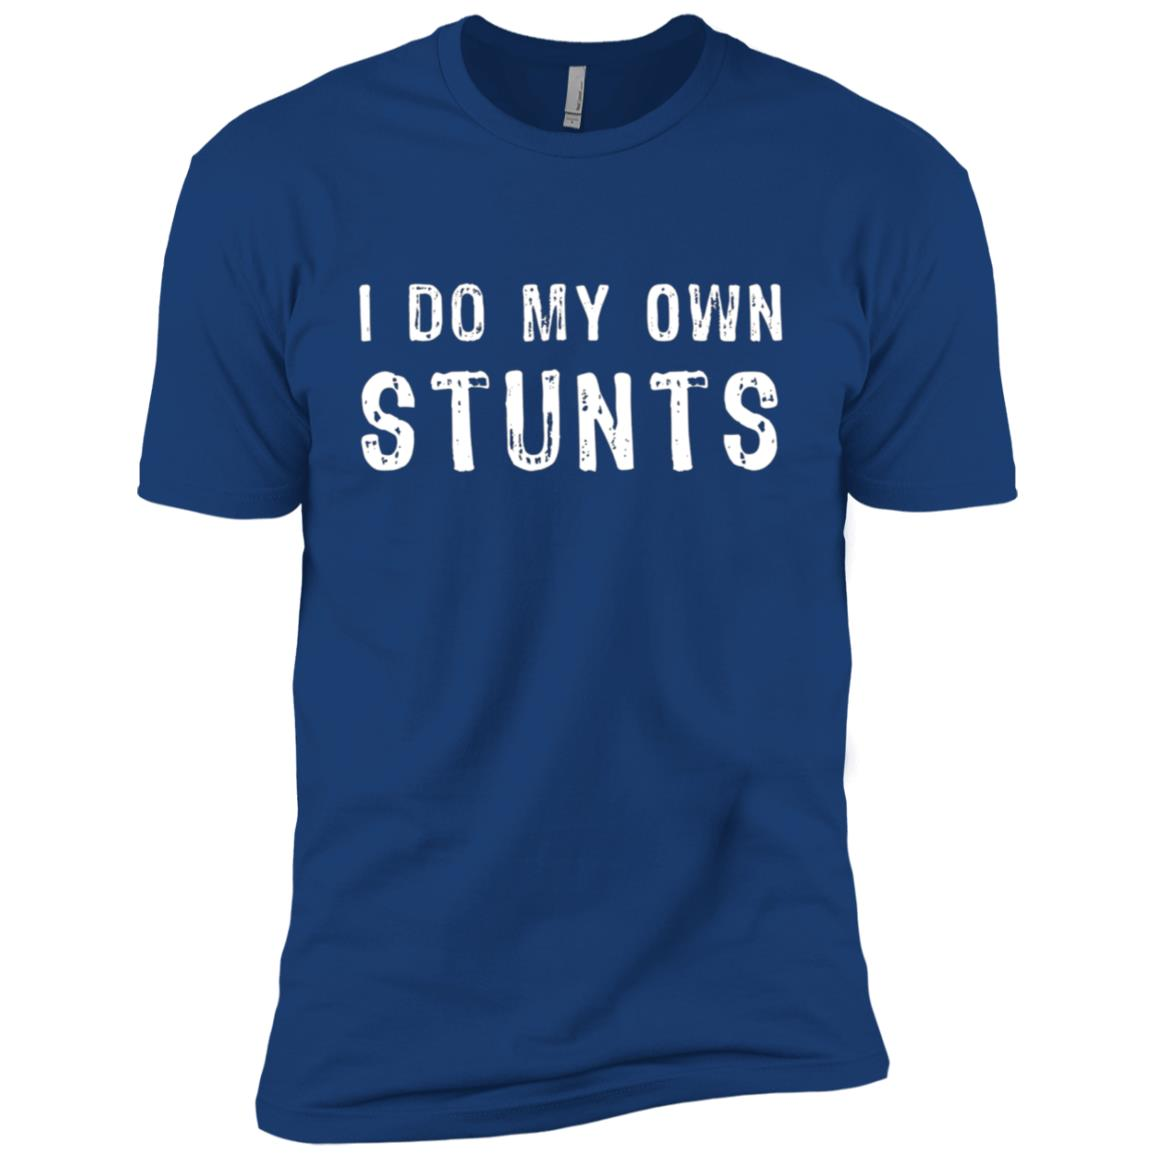 I Do My Own Stunts Funny -1 Men Short Sleeve T-Shirt